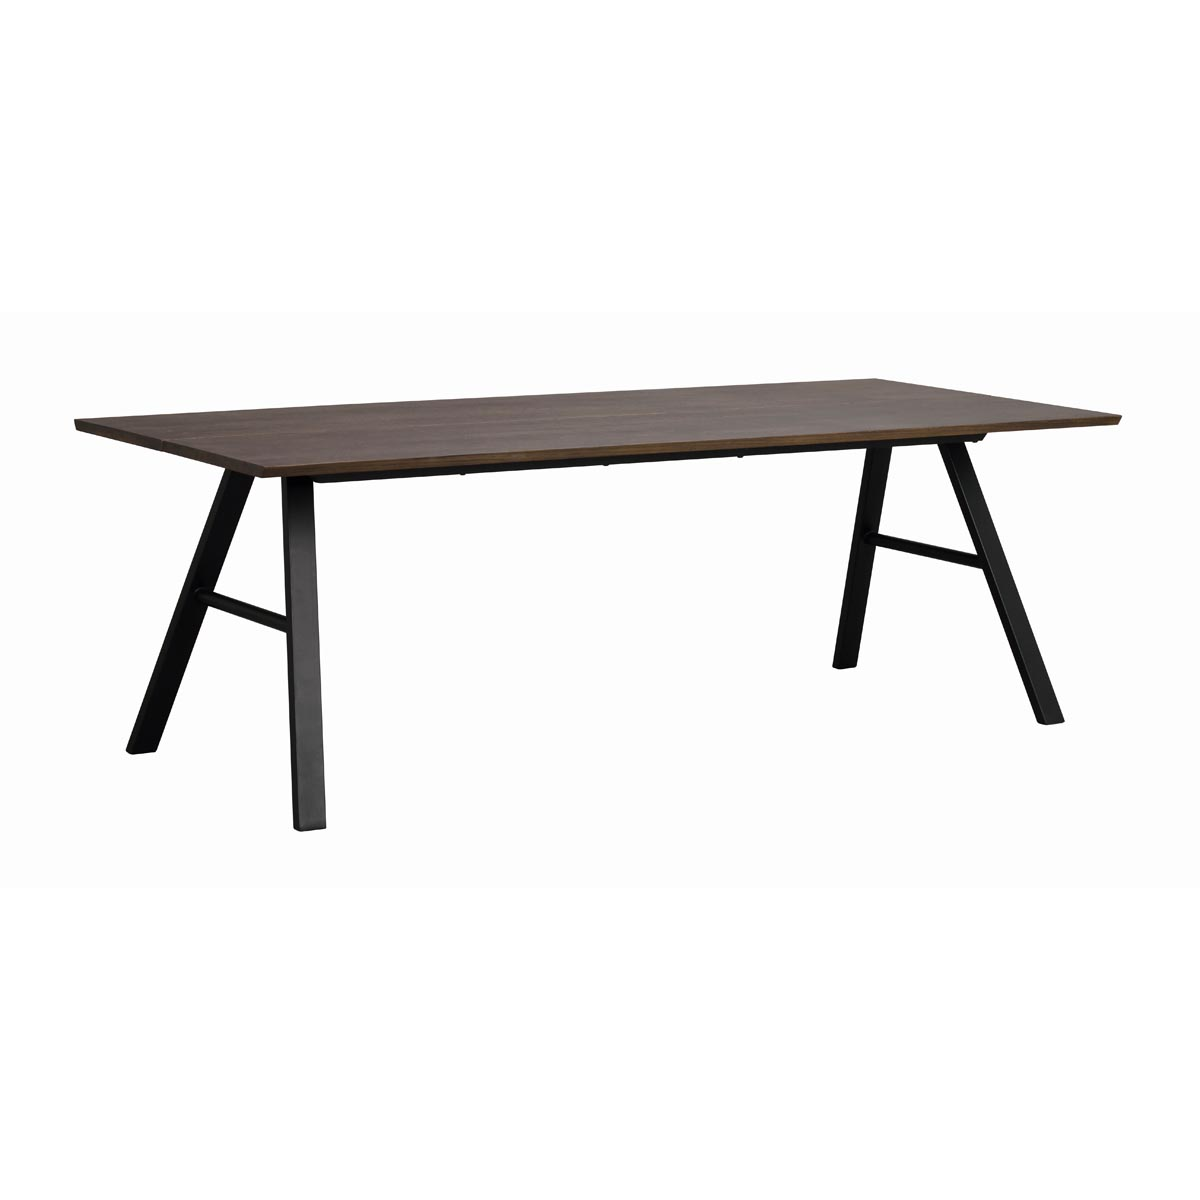 Brigham-matbord-brun-ekR-119401_b